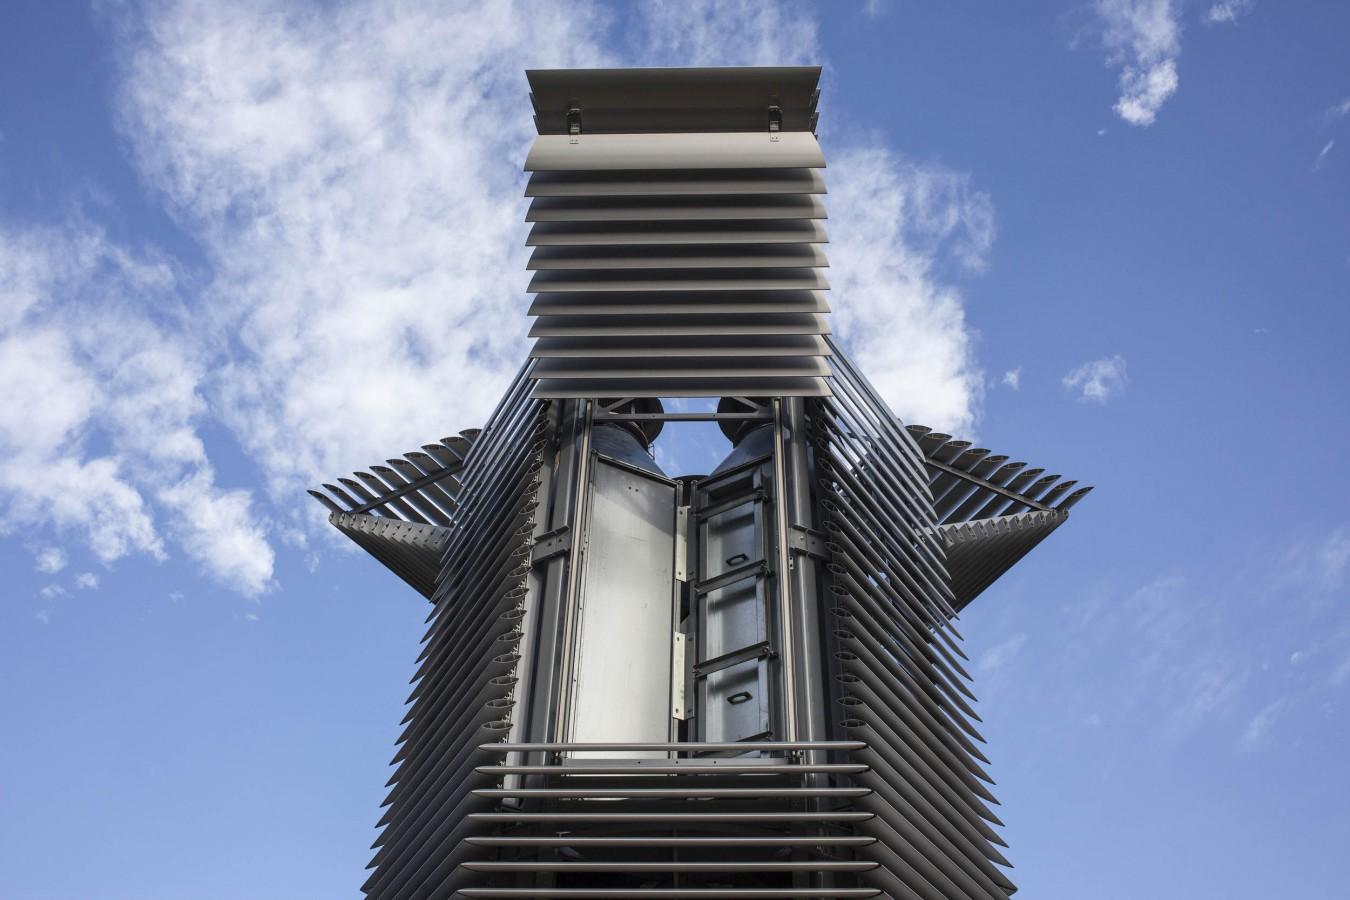 Smog Free Tower. Studio Roosegaarde